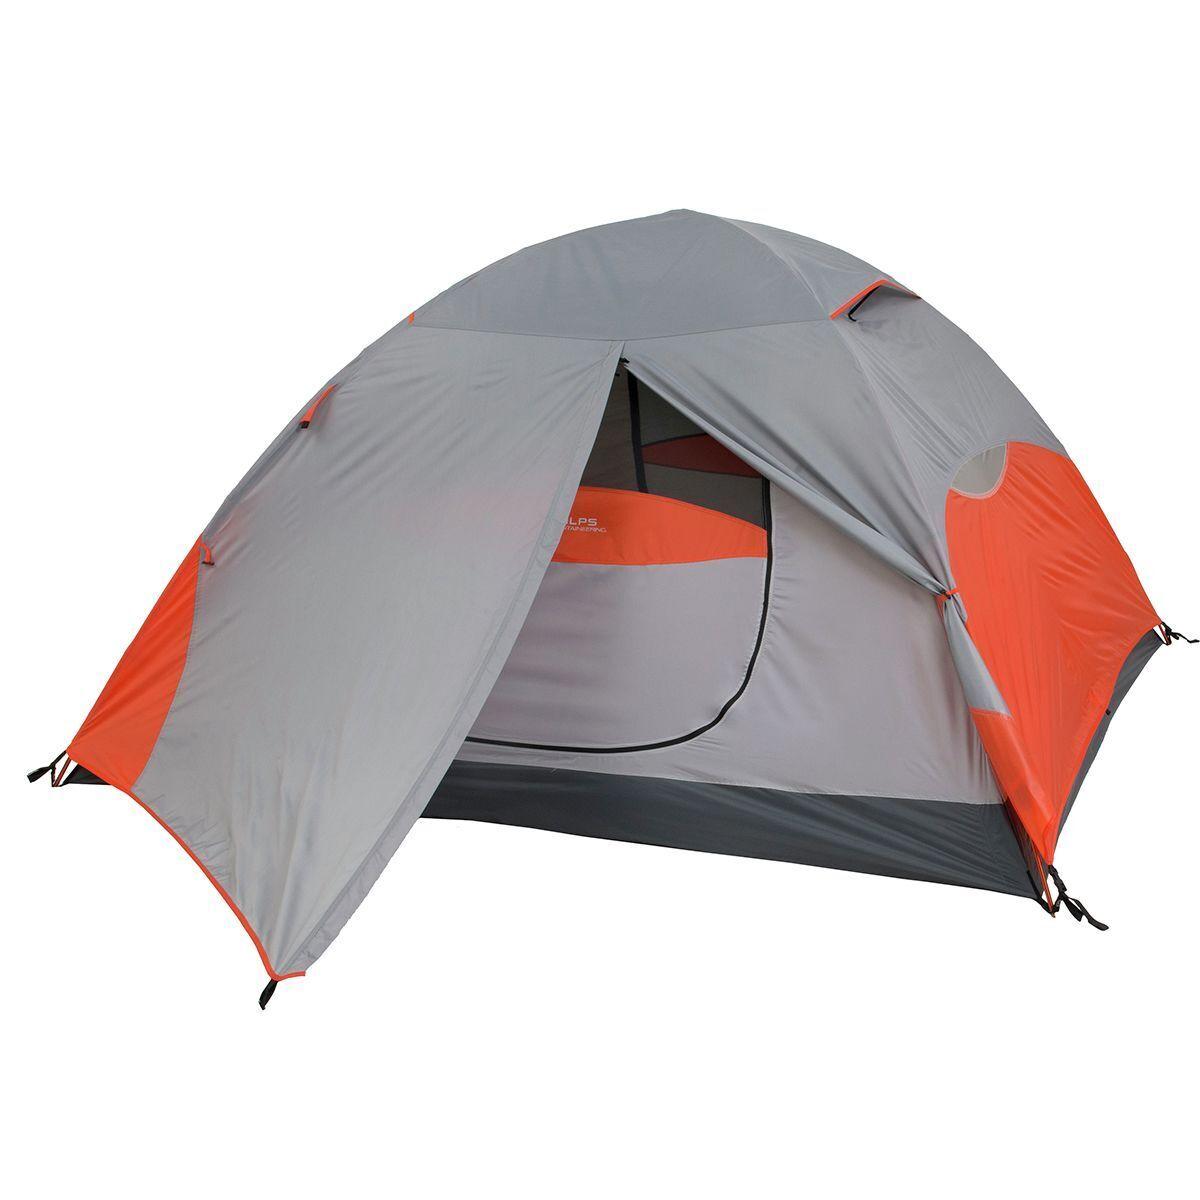 ALPS Mountaineering Koda 3 Tent: 3-Person 3-Season Orange/Grey, One Size